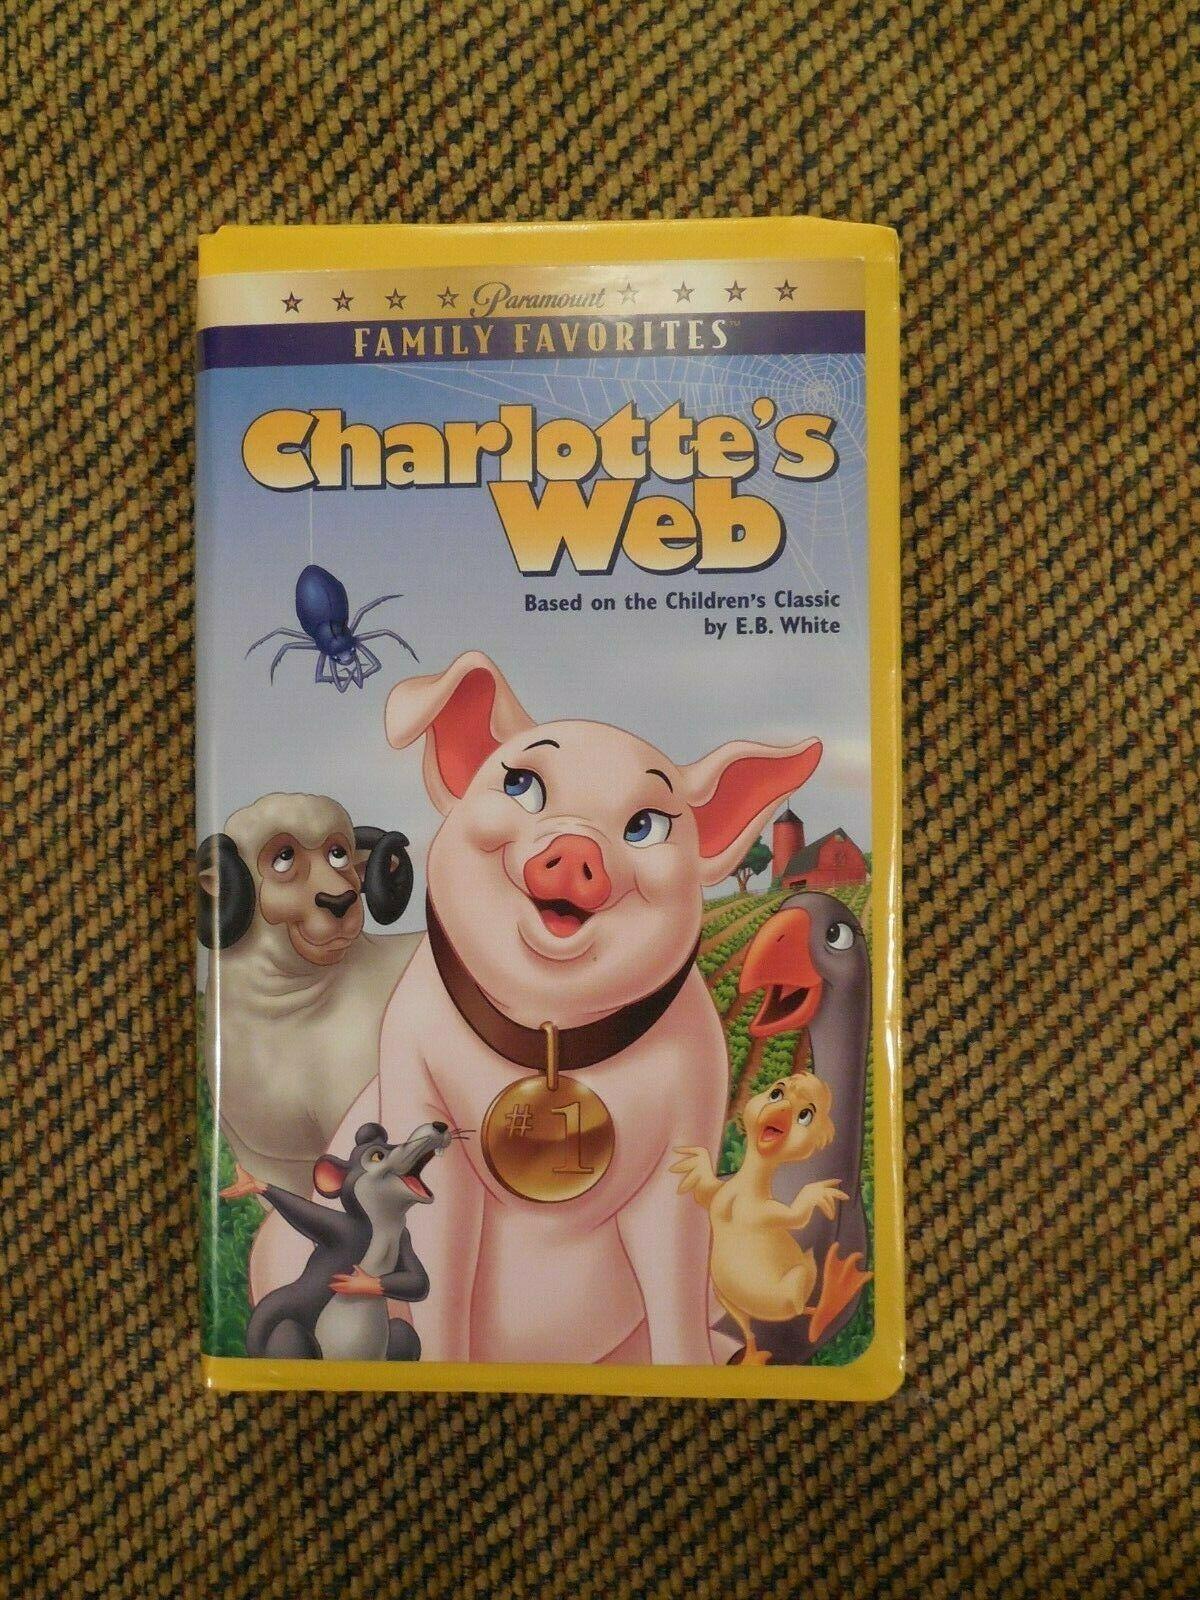 Charlotte's Web (2001-2004 VHS)